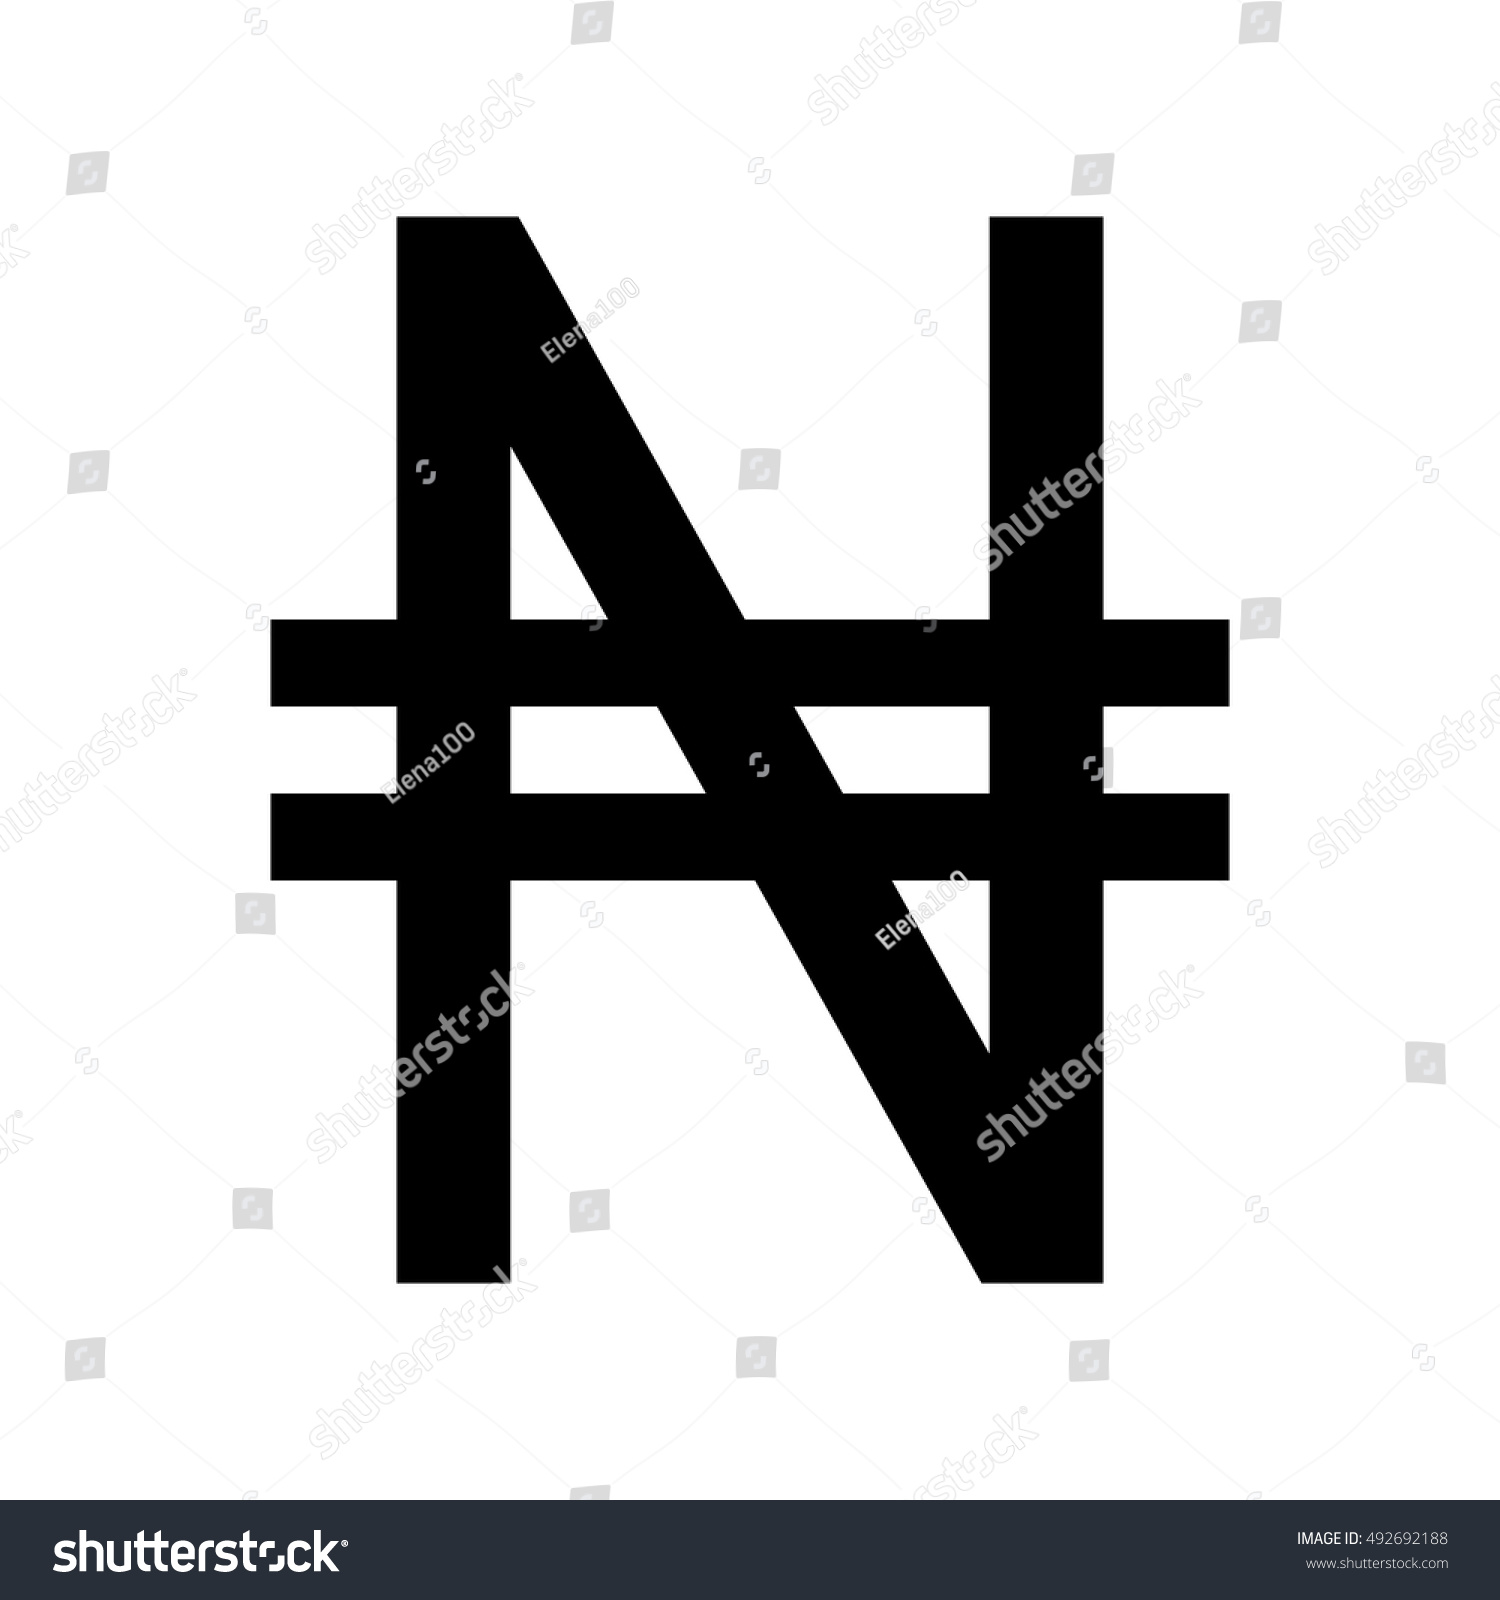 Nigerian Naira Currency Symbol Stock Vector Royalty Free 492692188